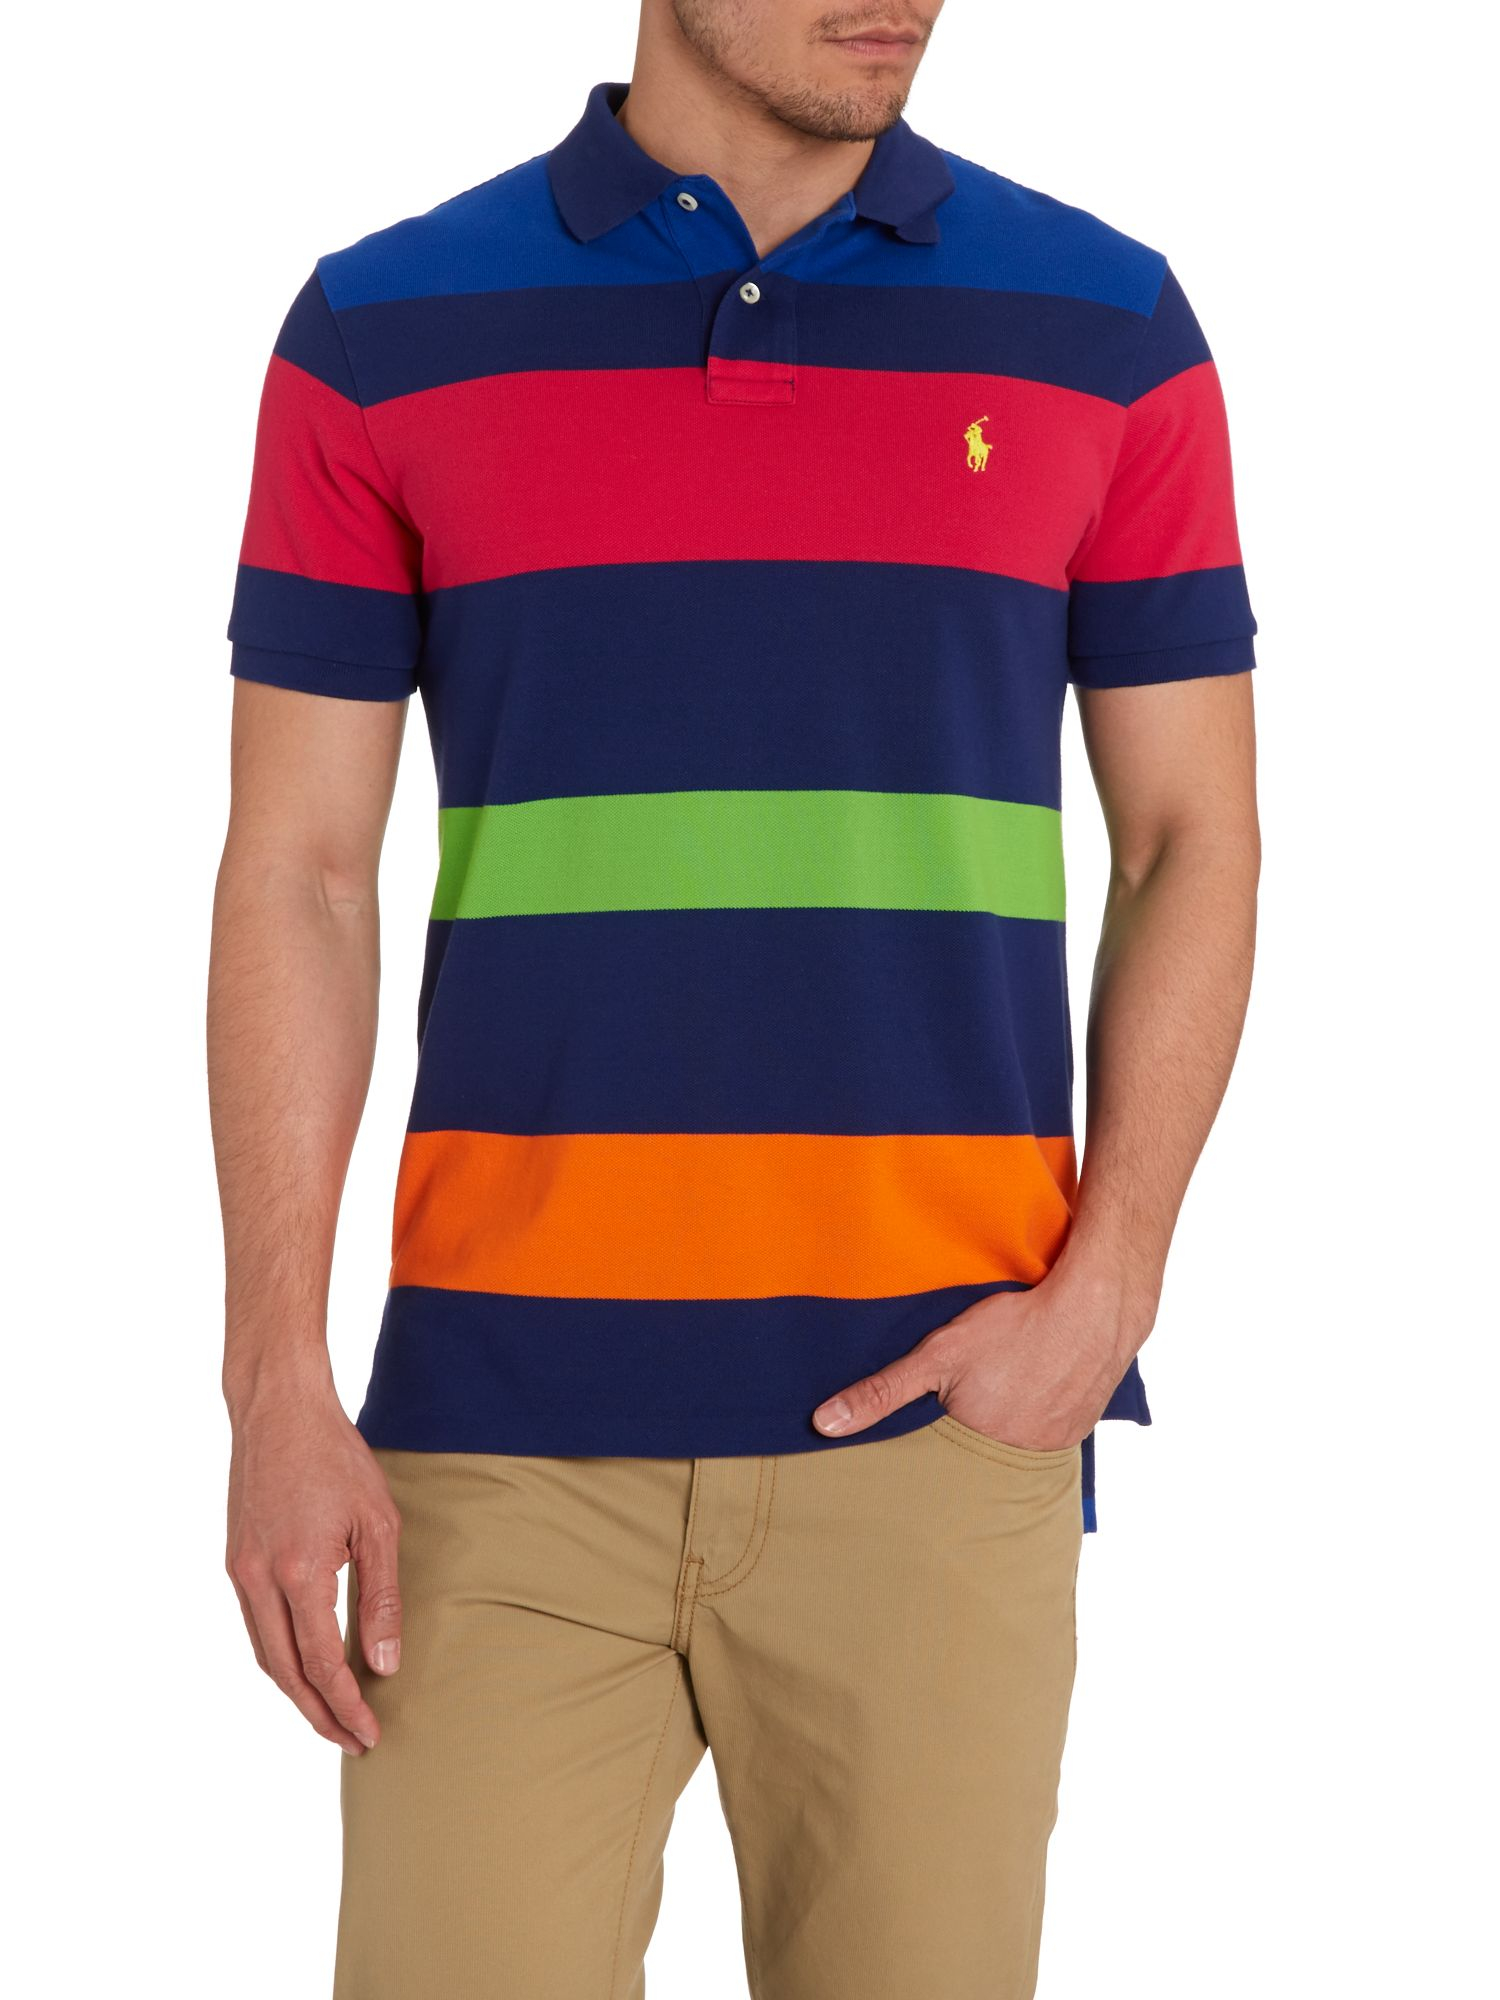 Polo ralph lauren multi stripe custom fit polo shirt in for Polo ralph lauren custom fit polo shirt